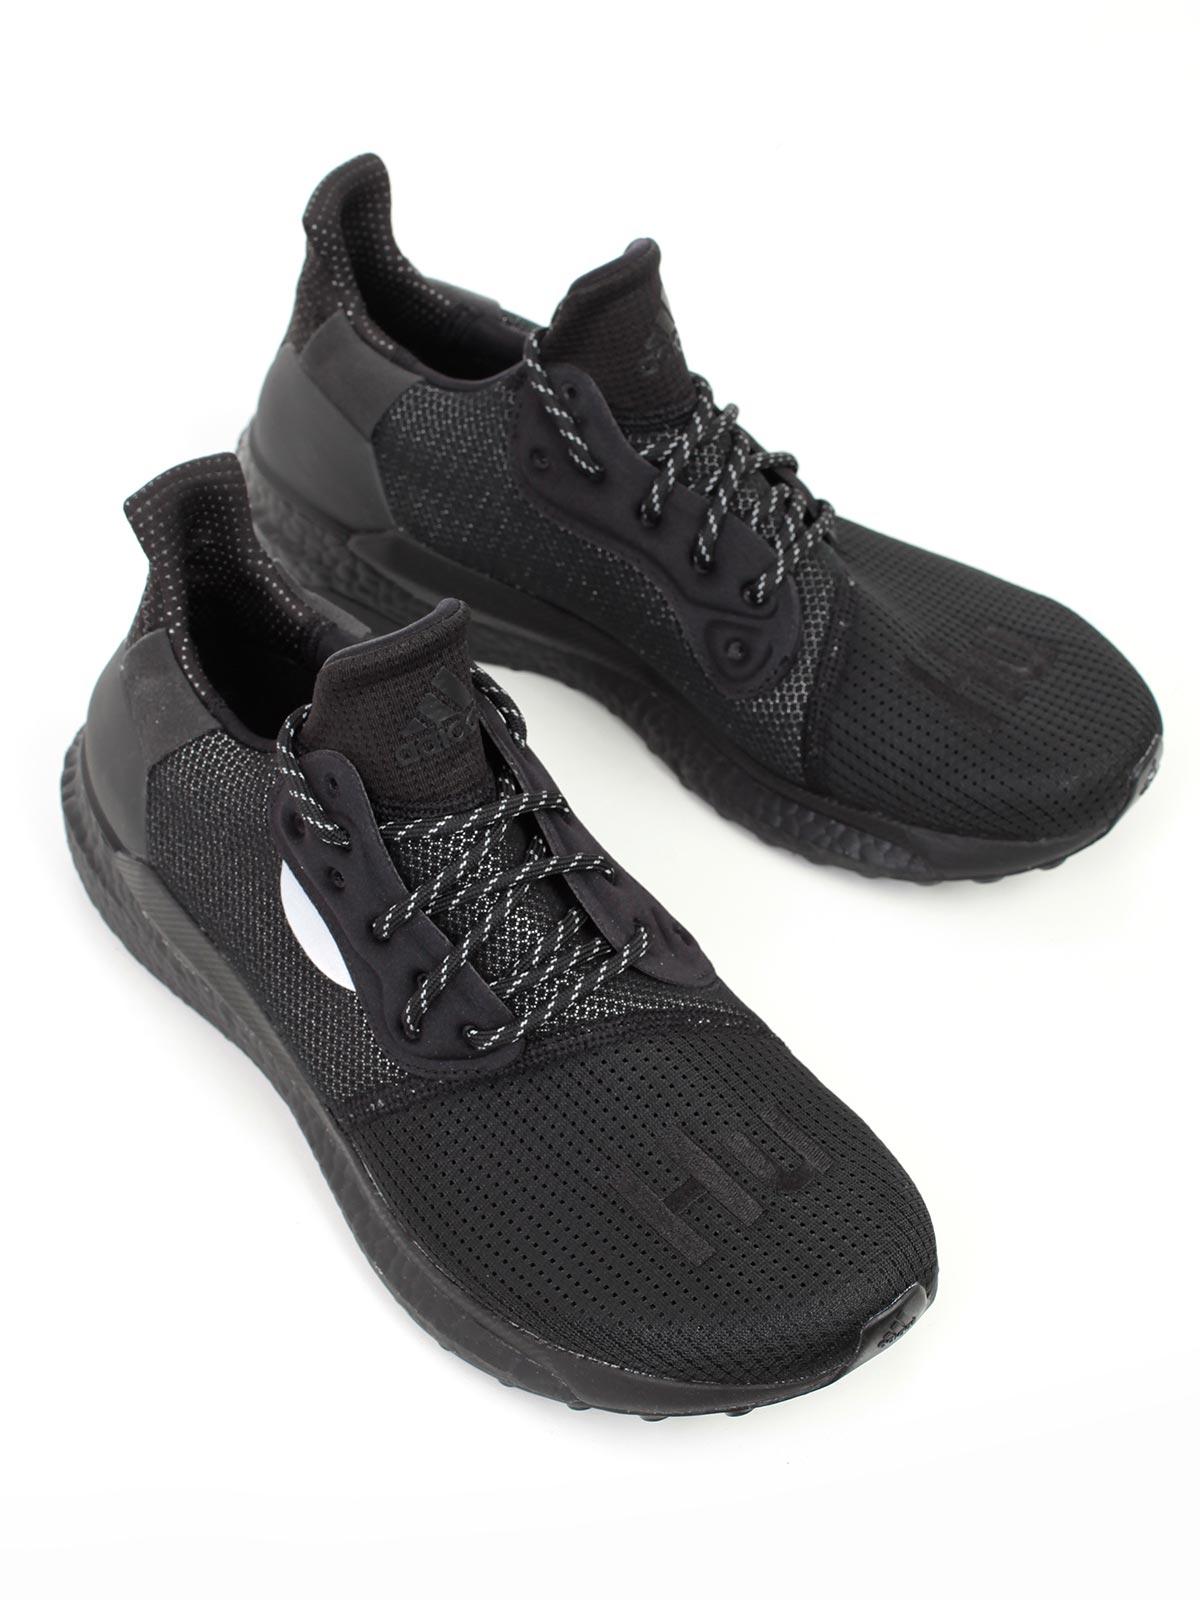 Adidas Pharrell Williams Hu Shoes